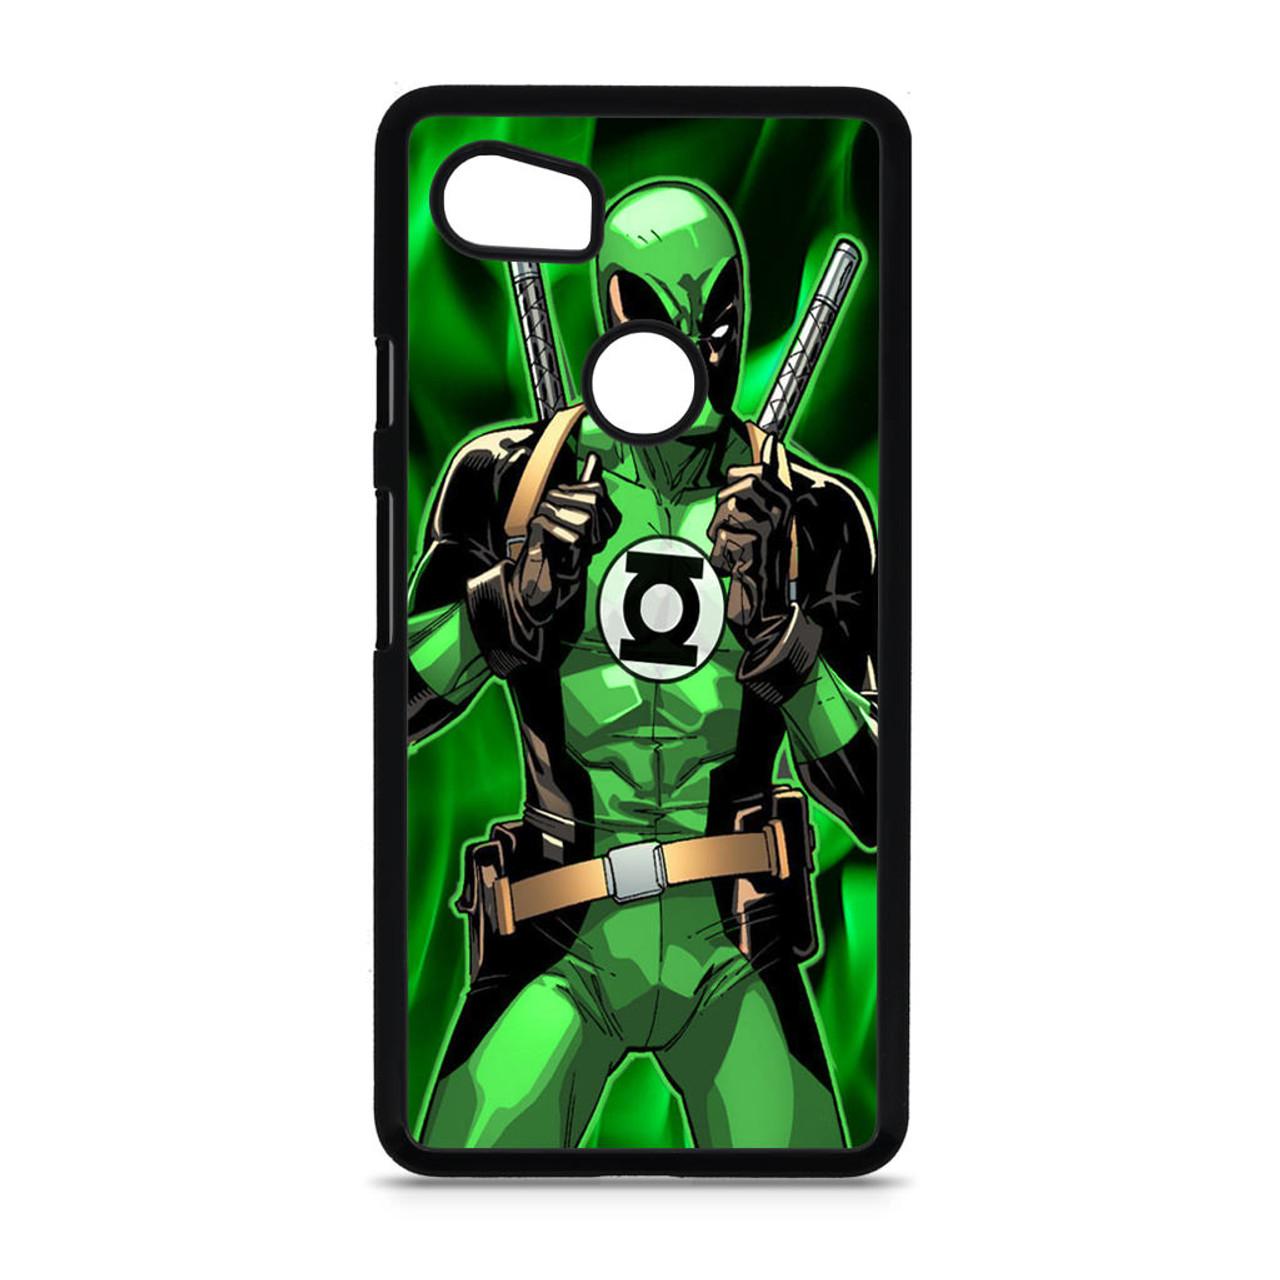 promo code f8bae 80285 Deadpool Green Latern Custom Google Pixel 2 XL Case